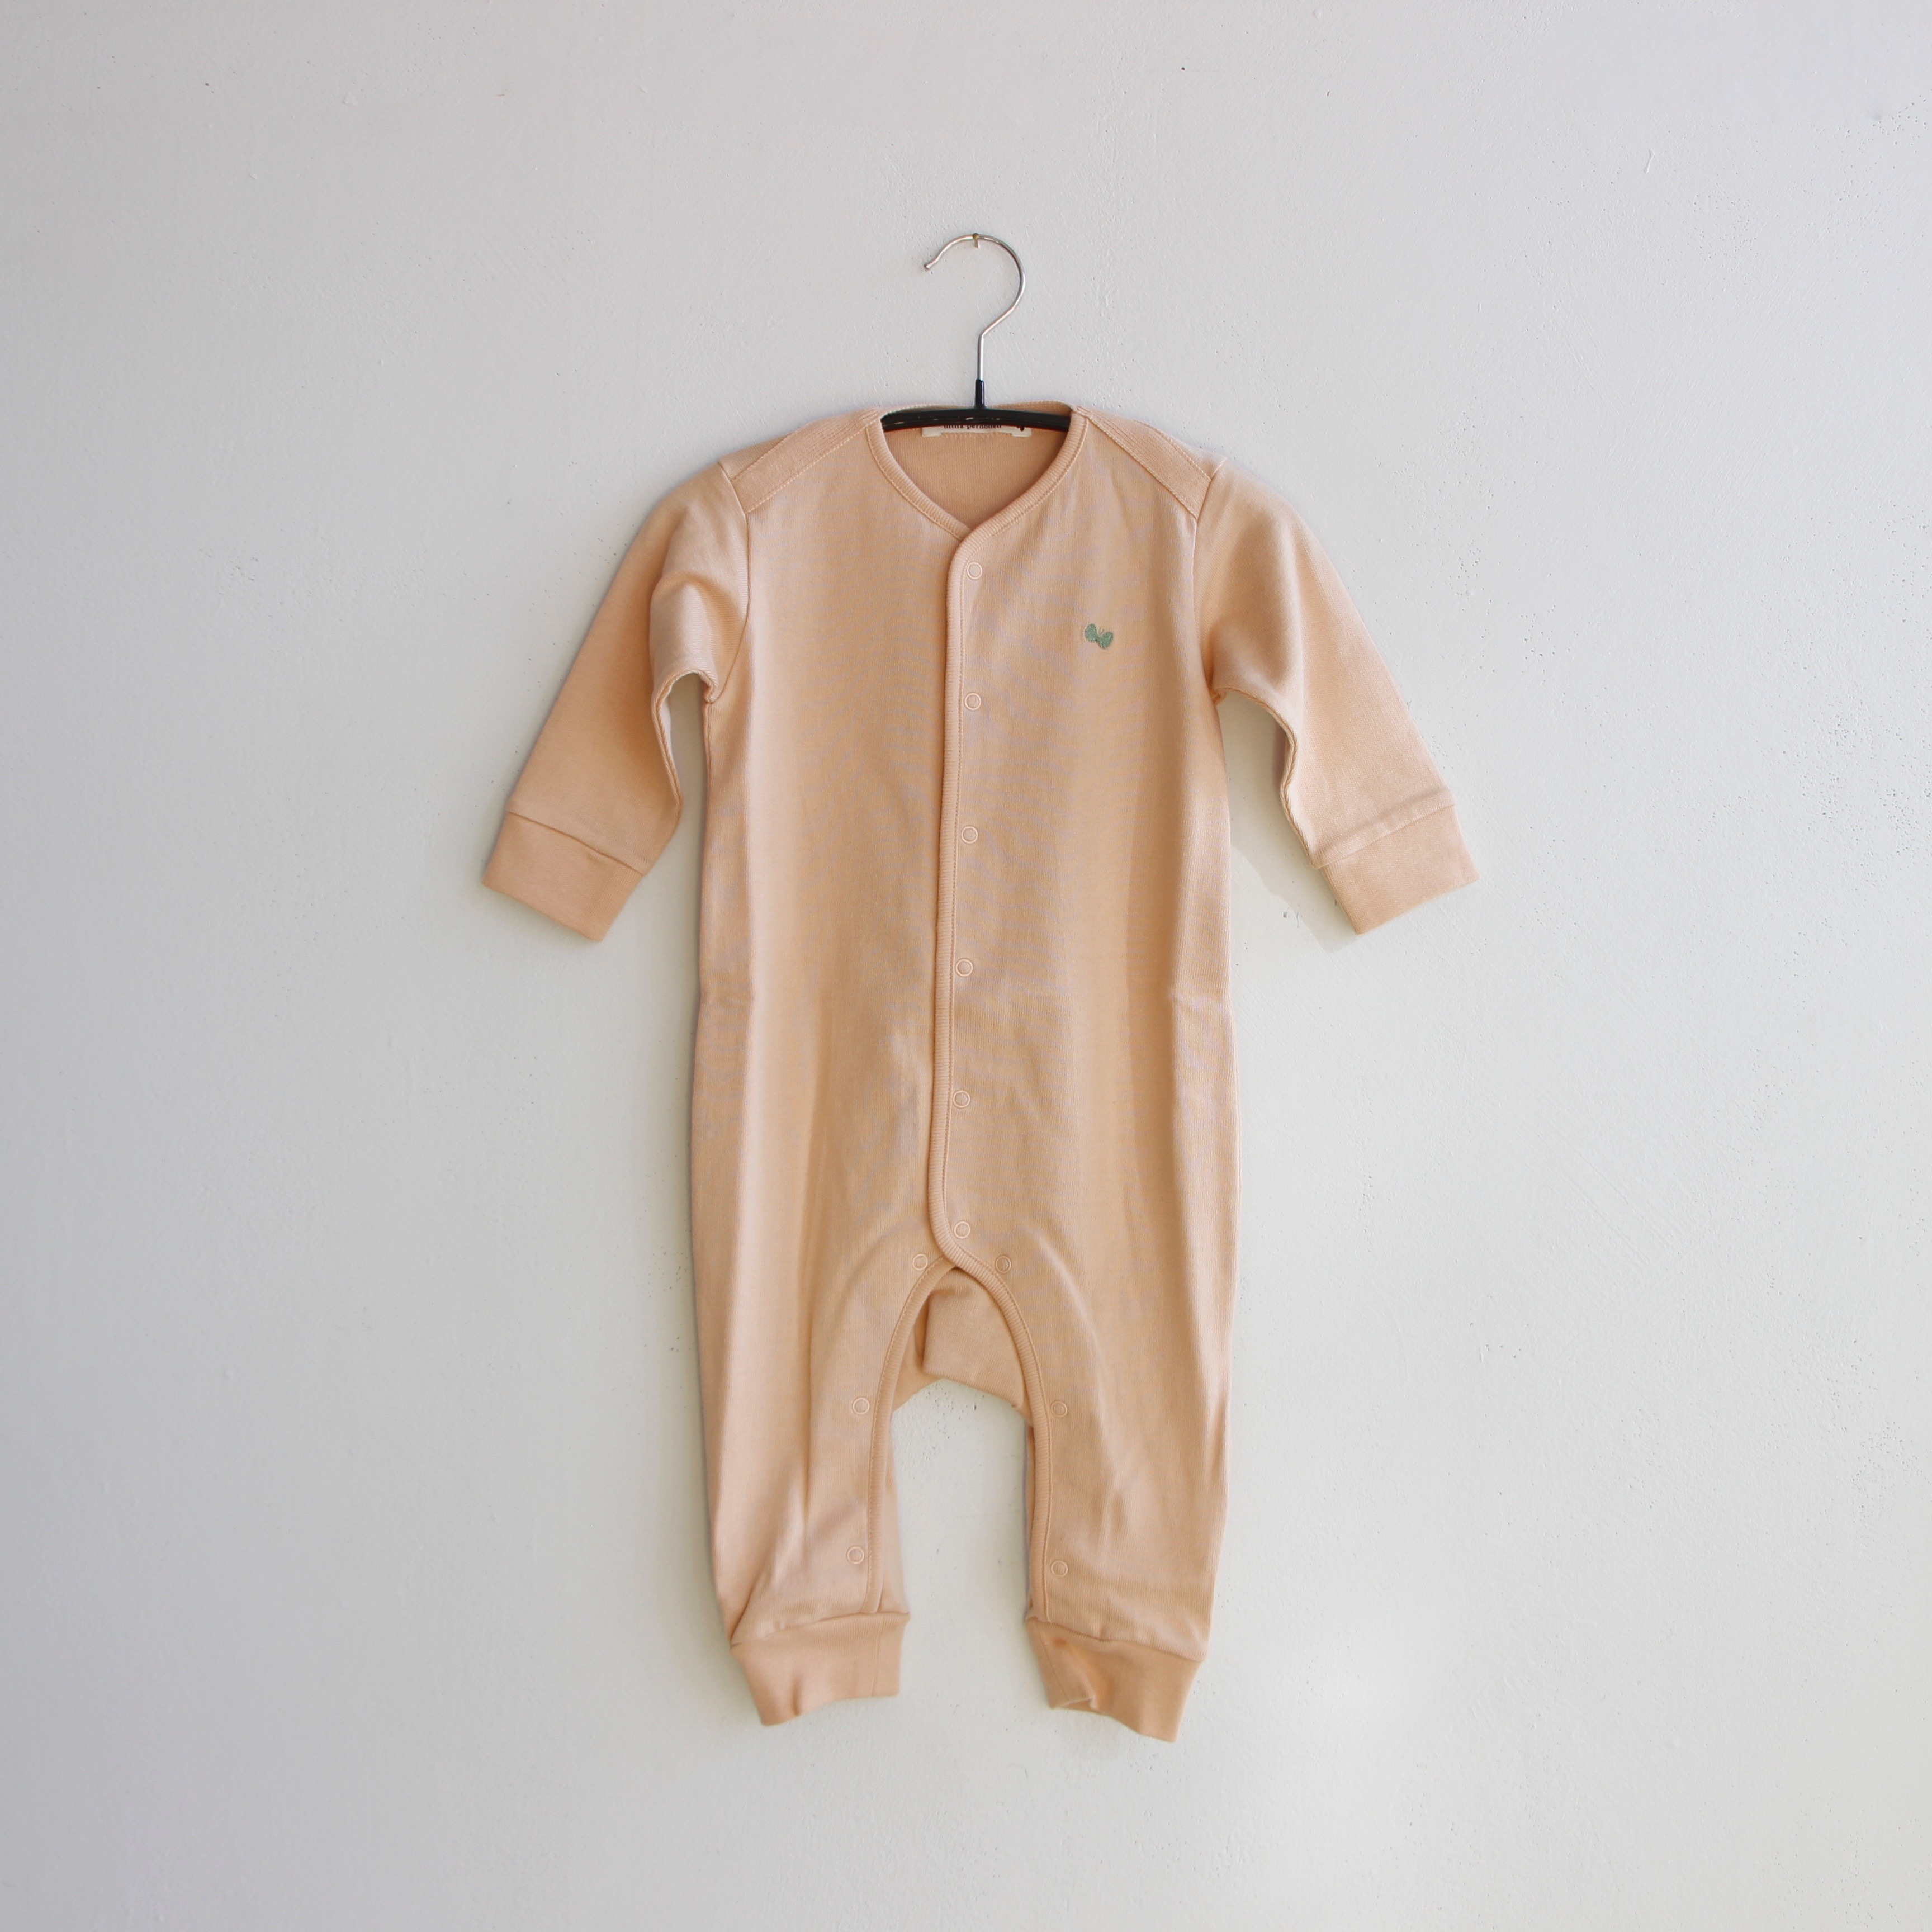 《mina perhonen 2020AW》zutto ロンパース / pinkbeige / 70cm